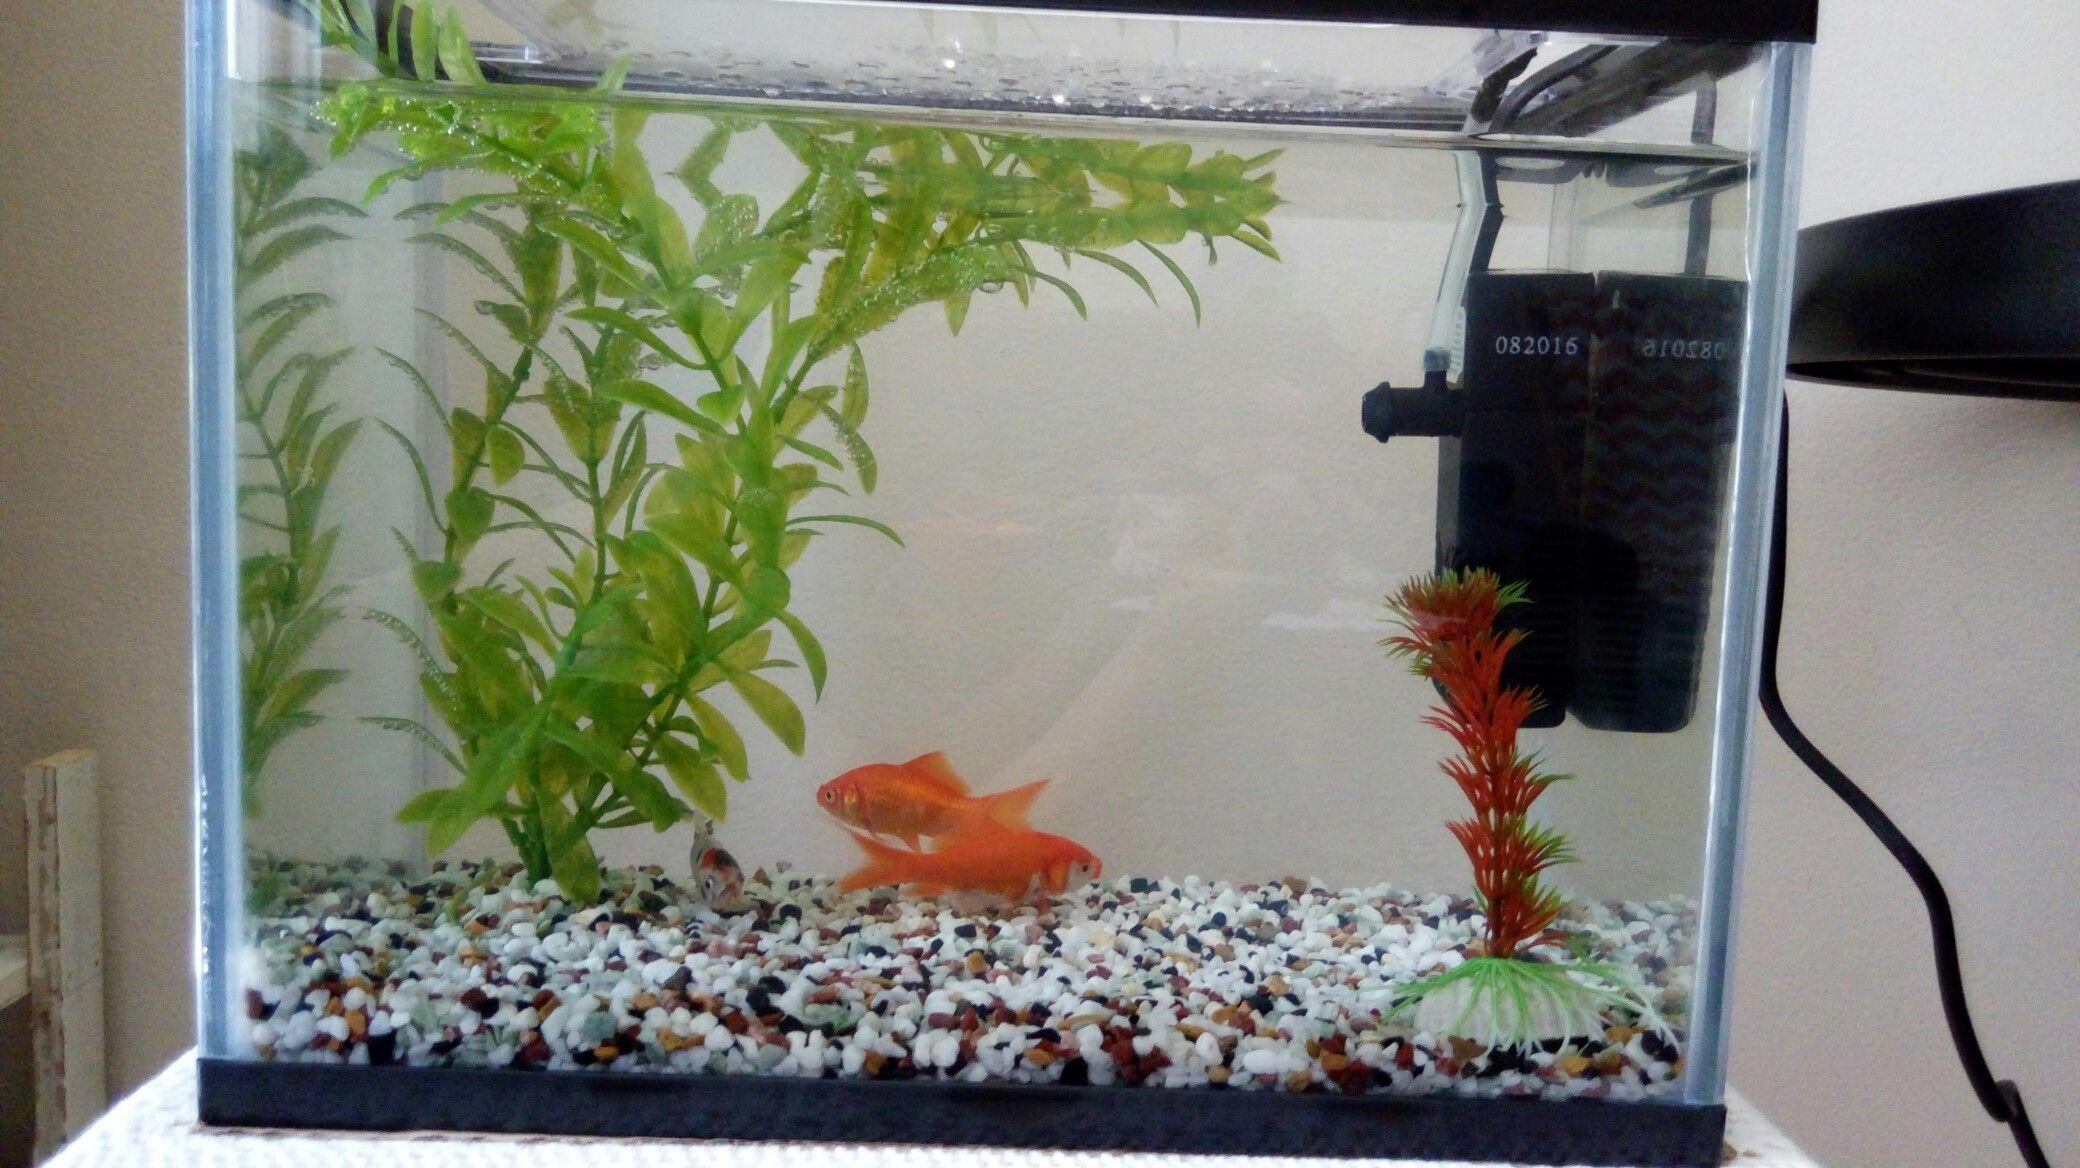 Goldfish pond species decor references - Goldfish Tank